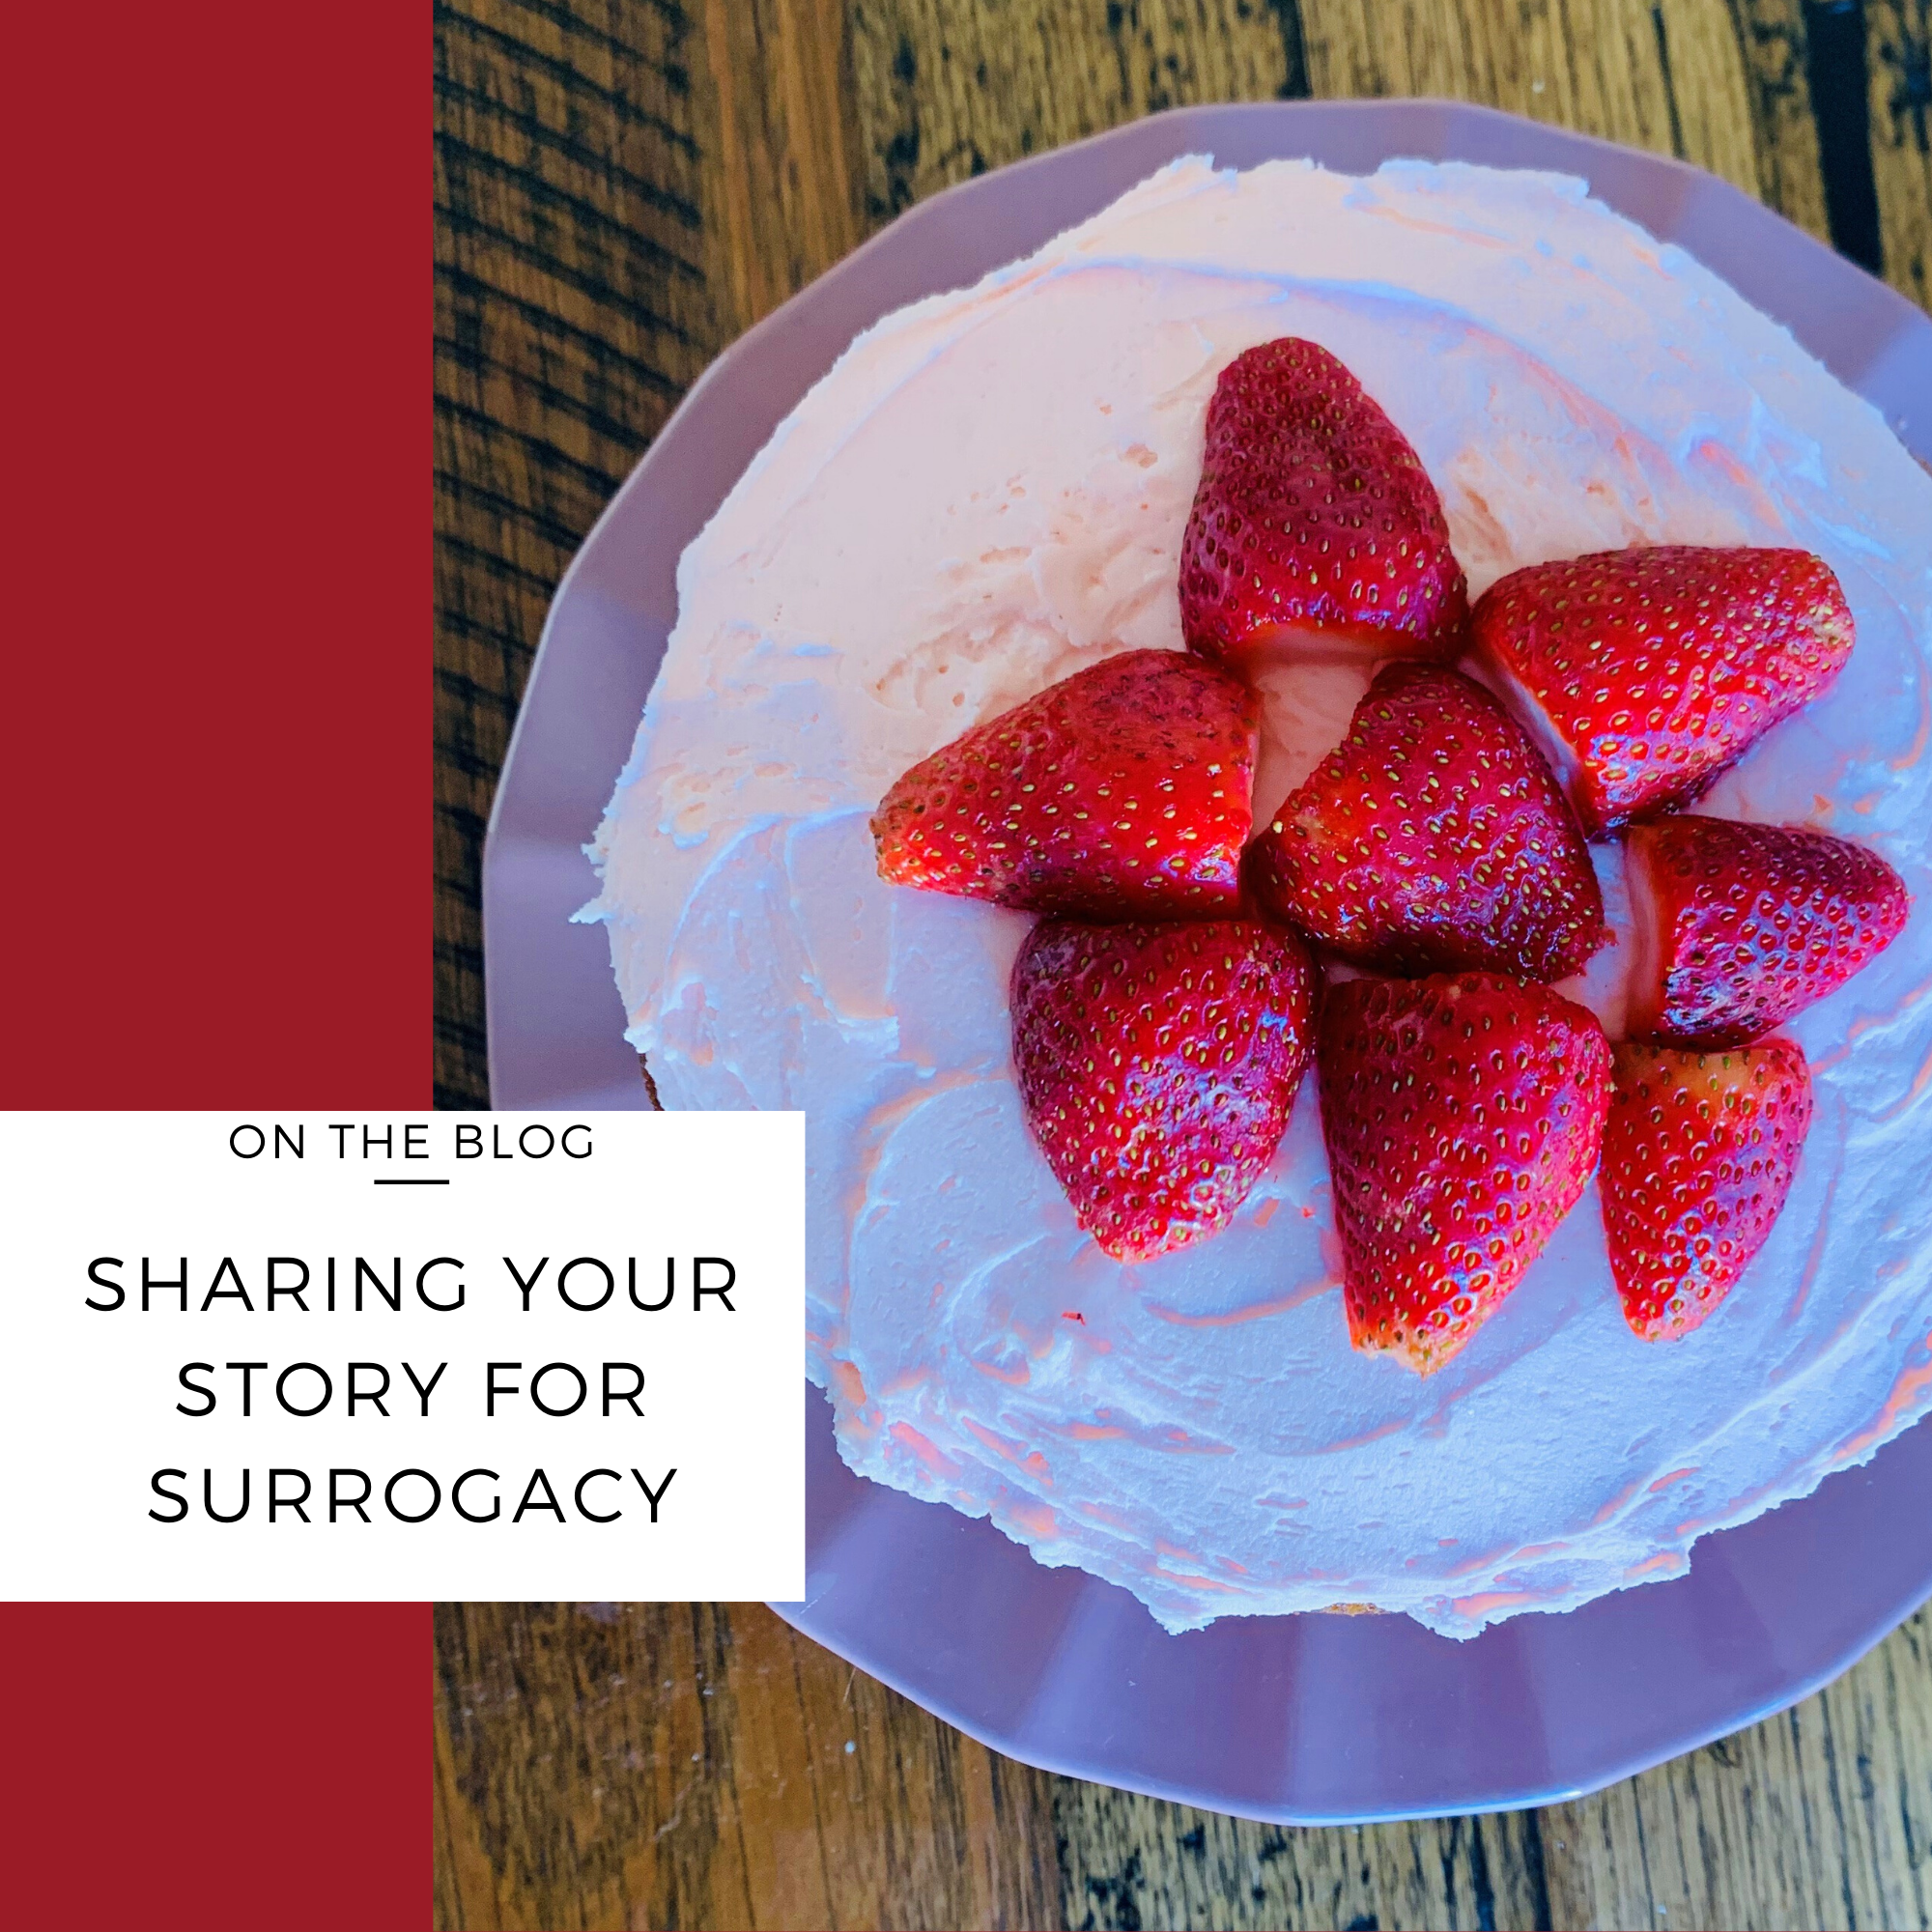 sharing surrogacy story